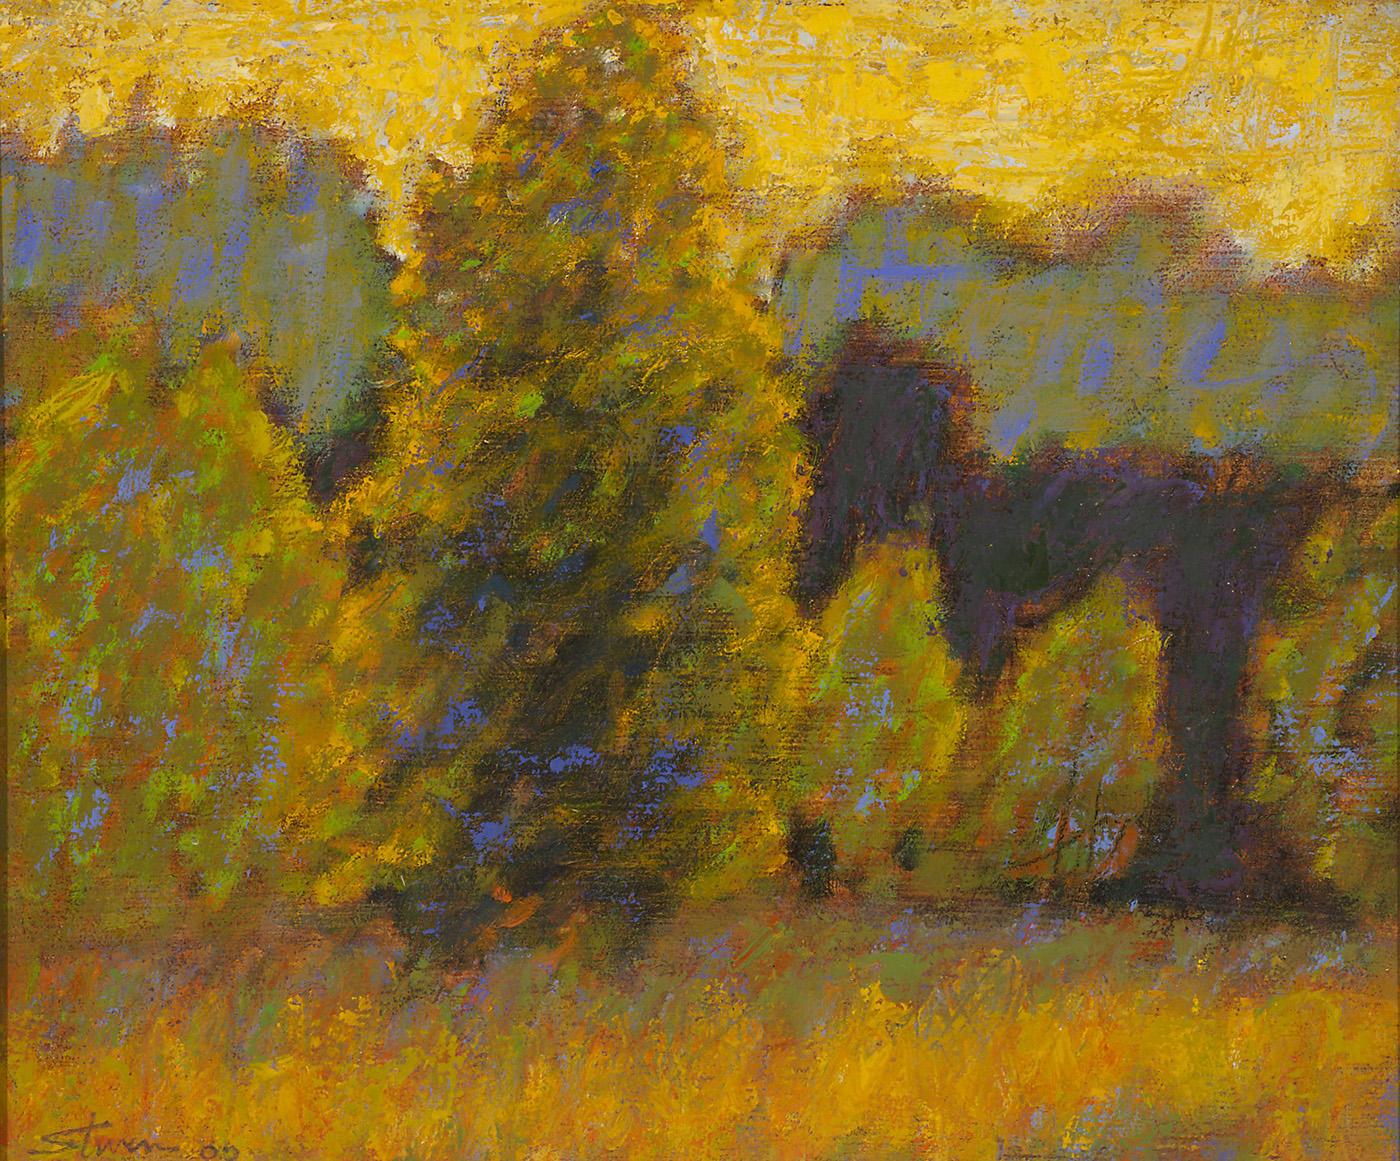 "Midsummer Light   | oil on linen | 10 x 12"" | 2000"